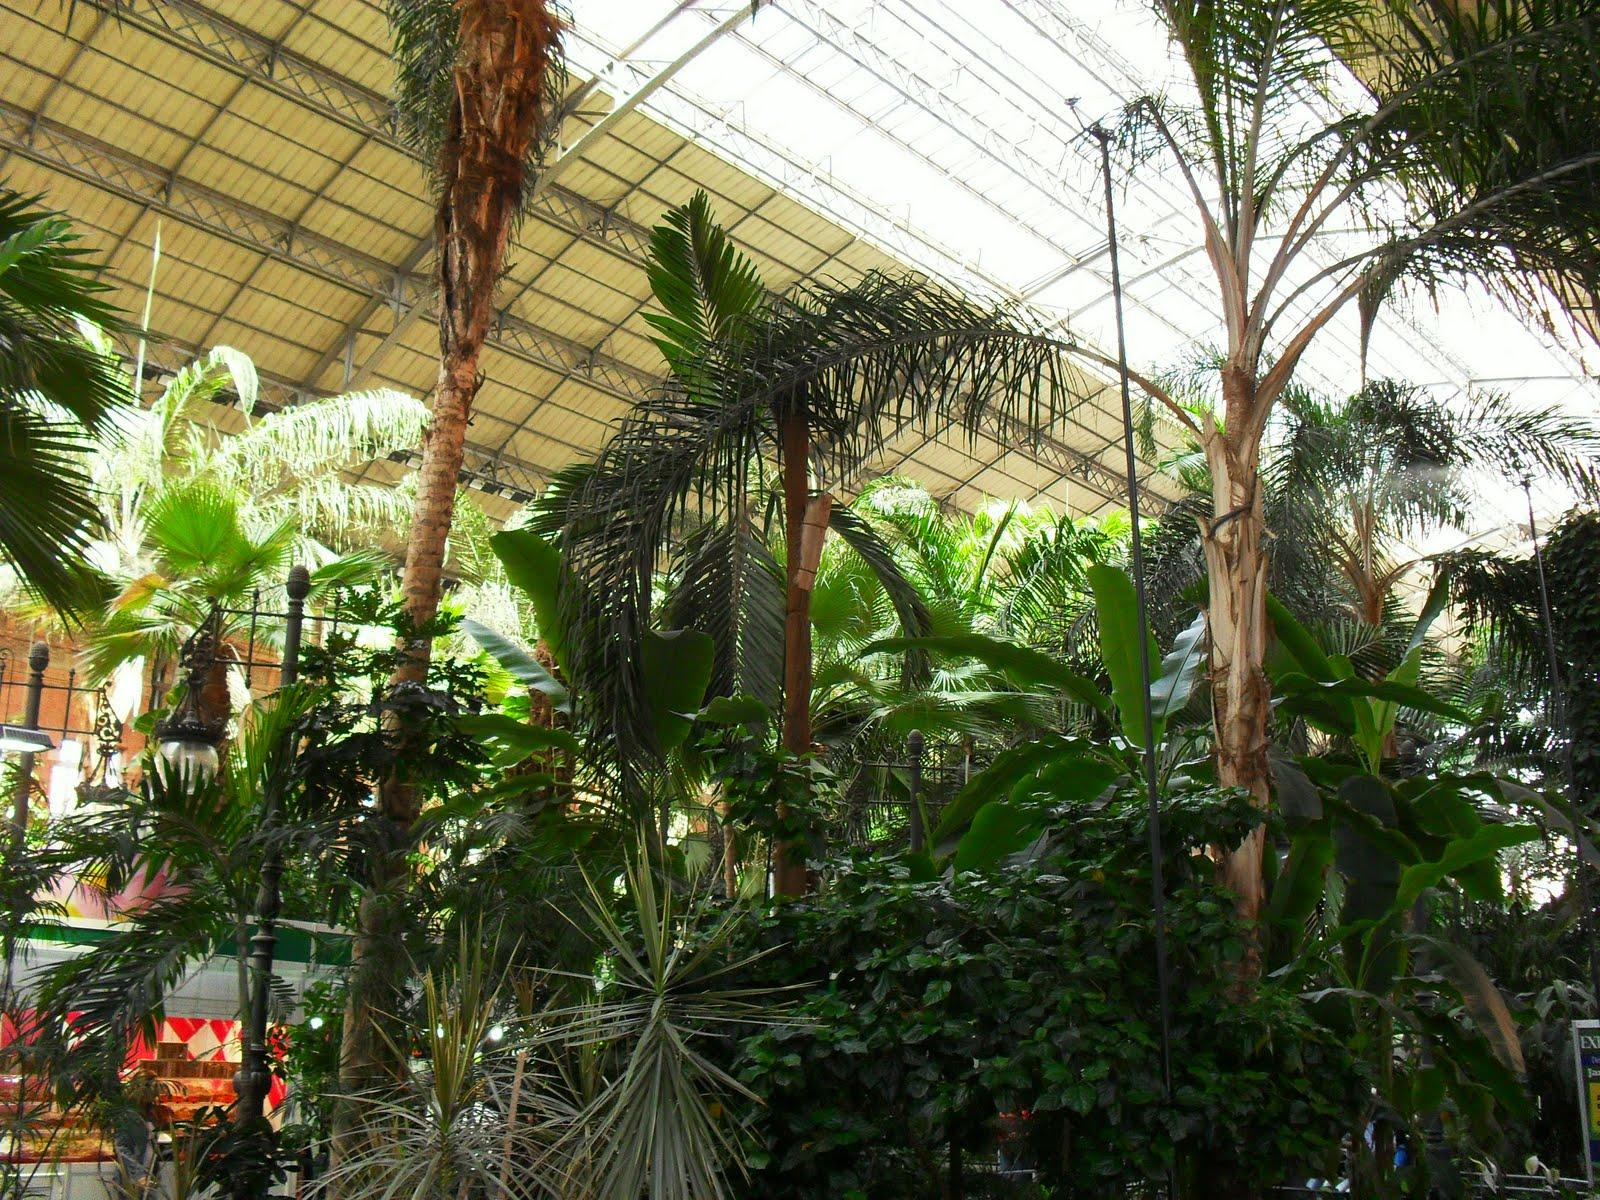 Arte y jardiner a jard n tropical estaci n de atocha - Jardin tropical atocha ...